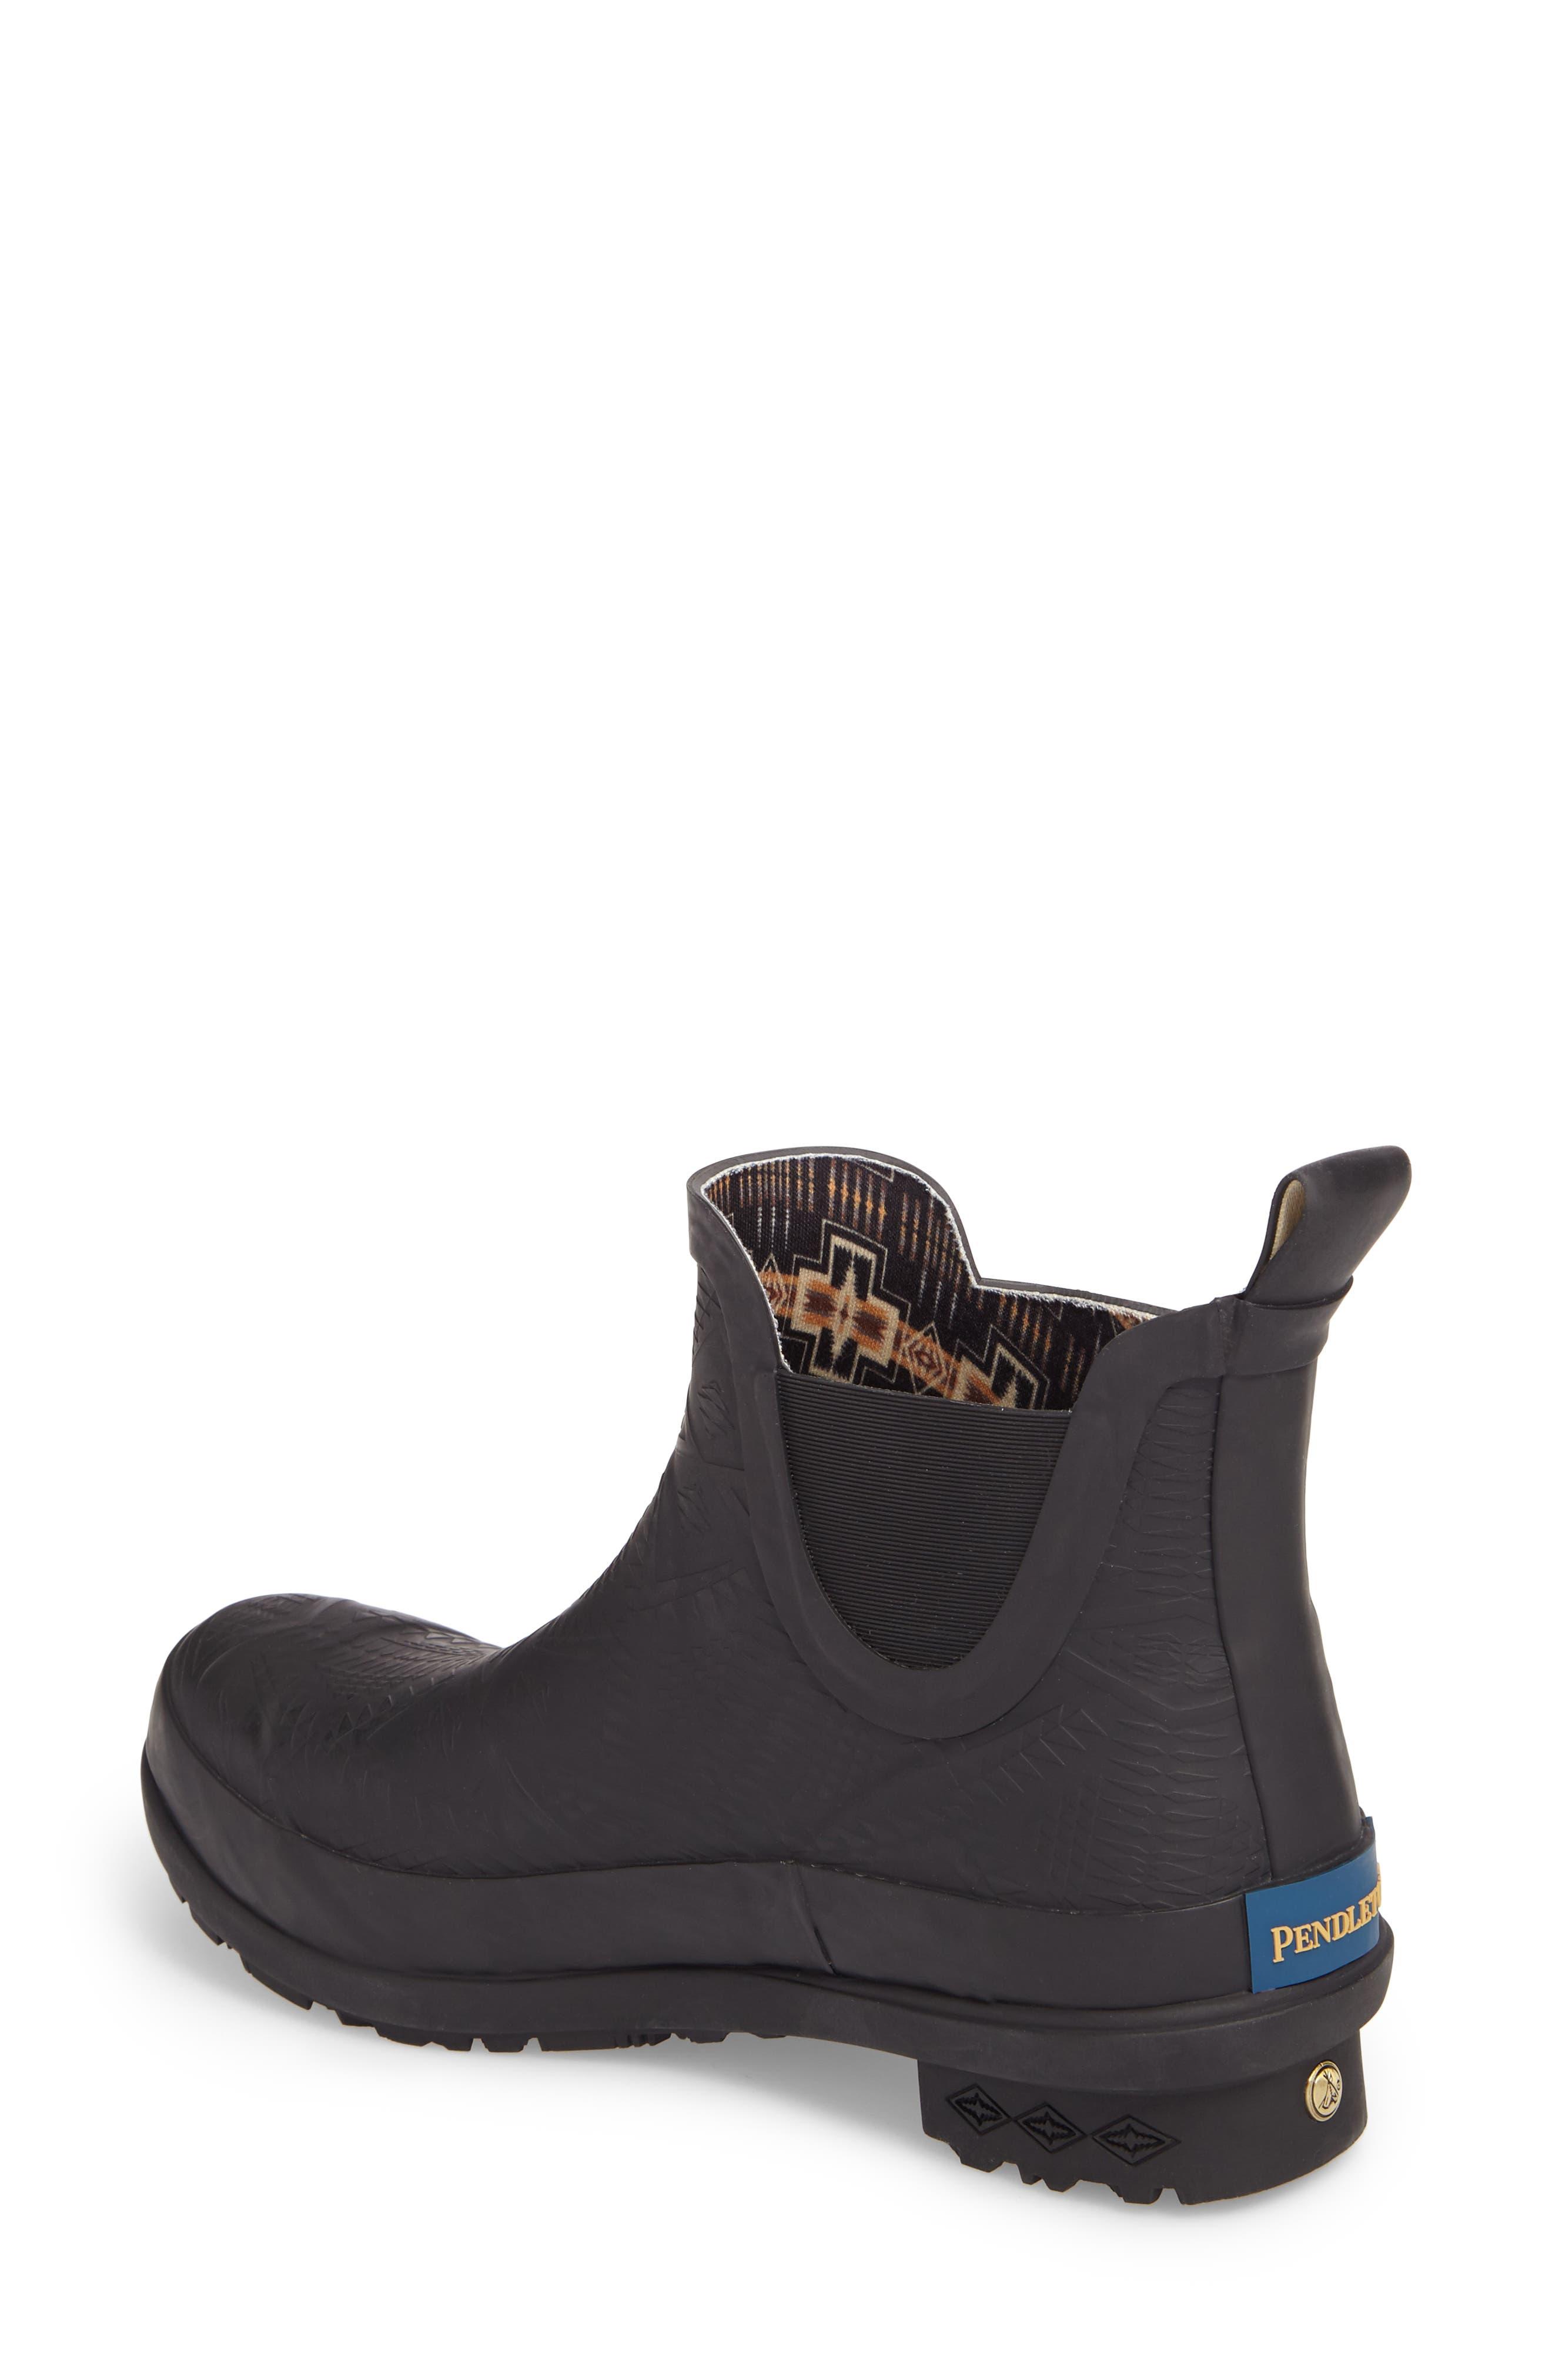 Pendleton Embossed Chelsea Rain Boot,                             Alternate thumbnail 2, color,                             Black